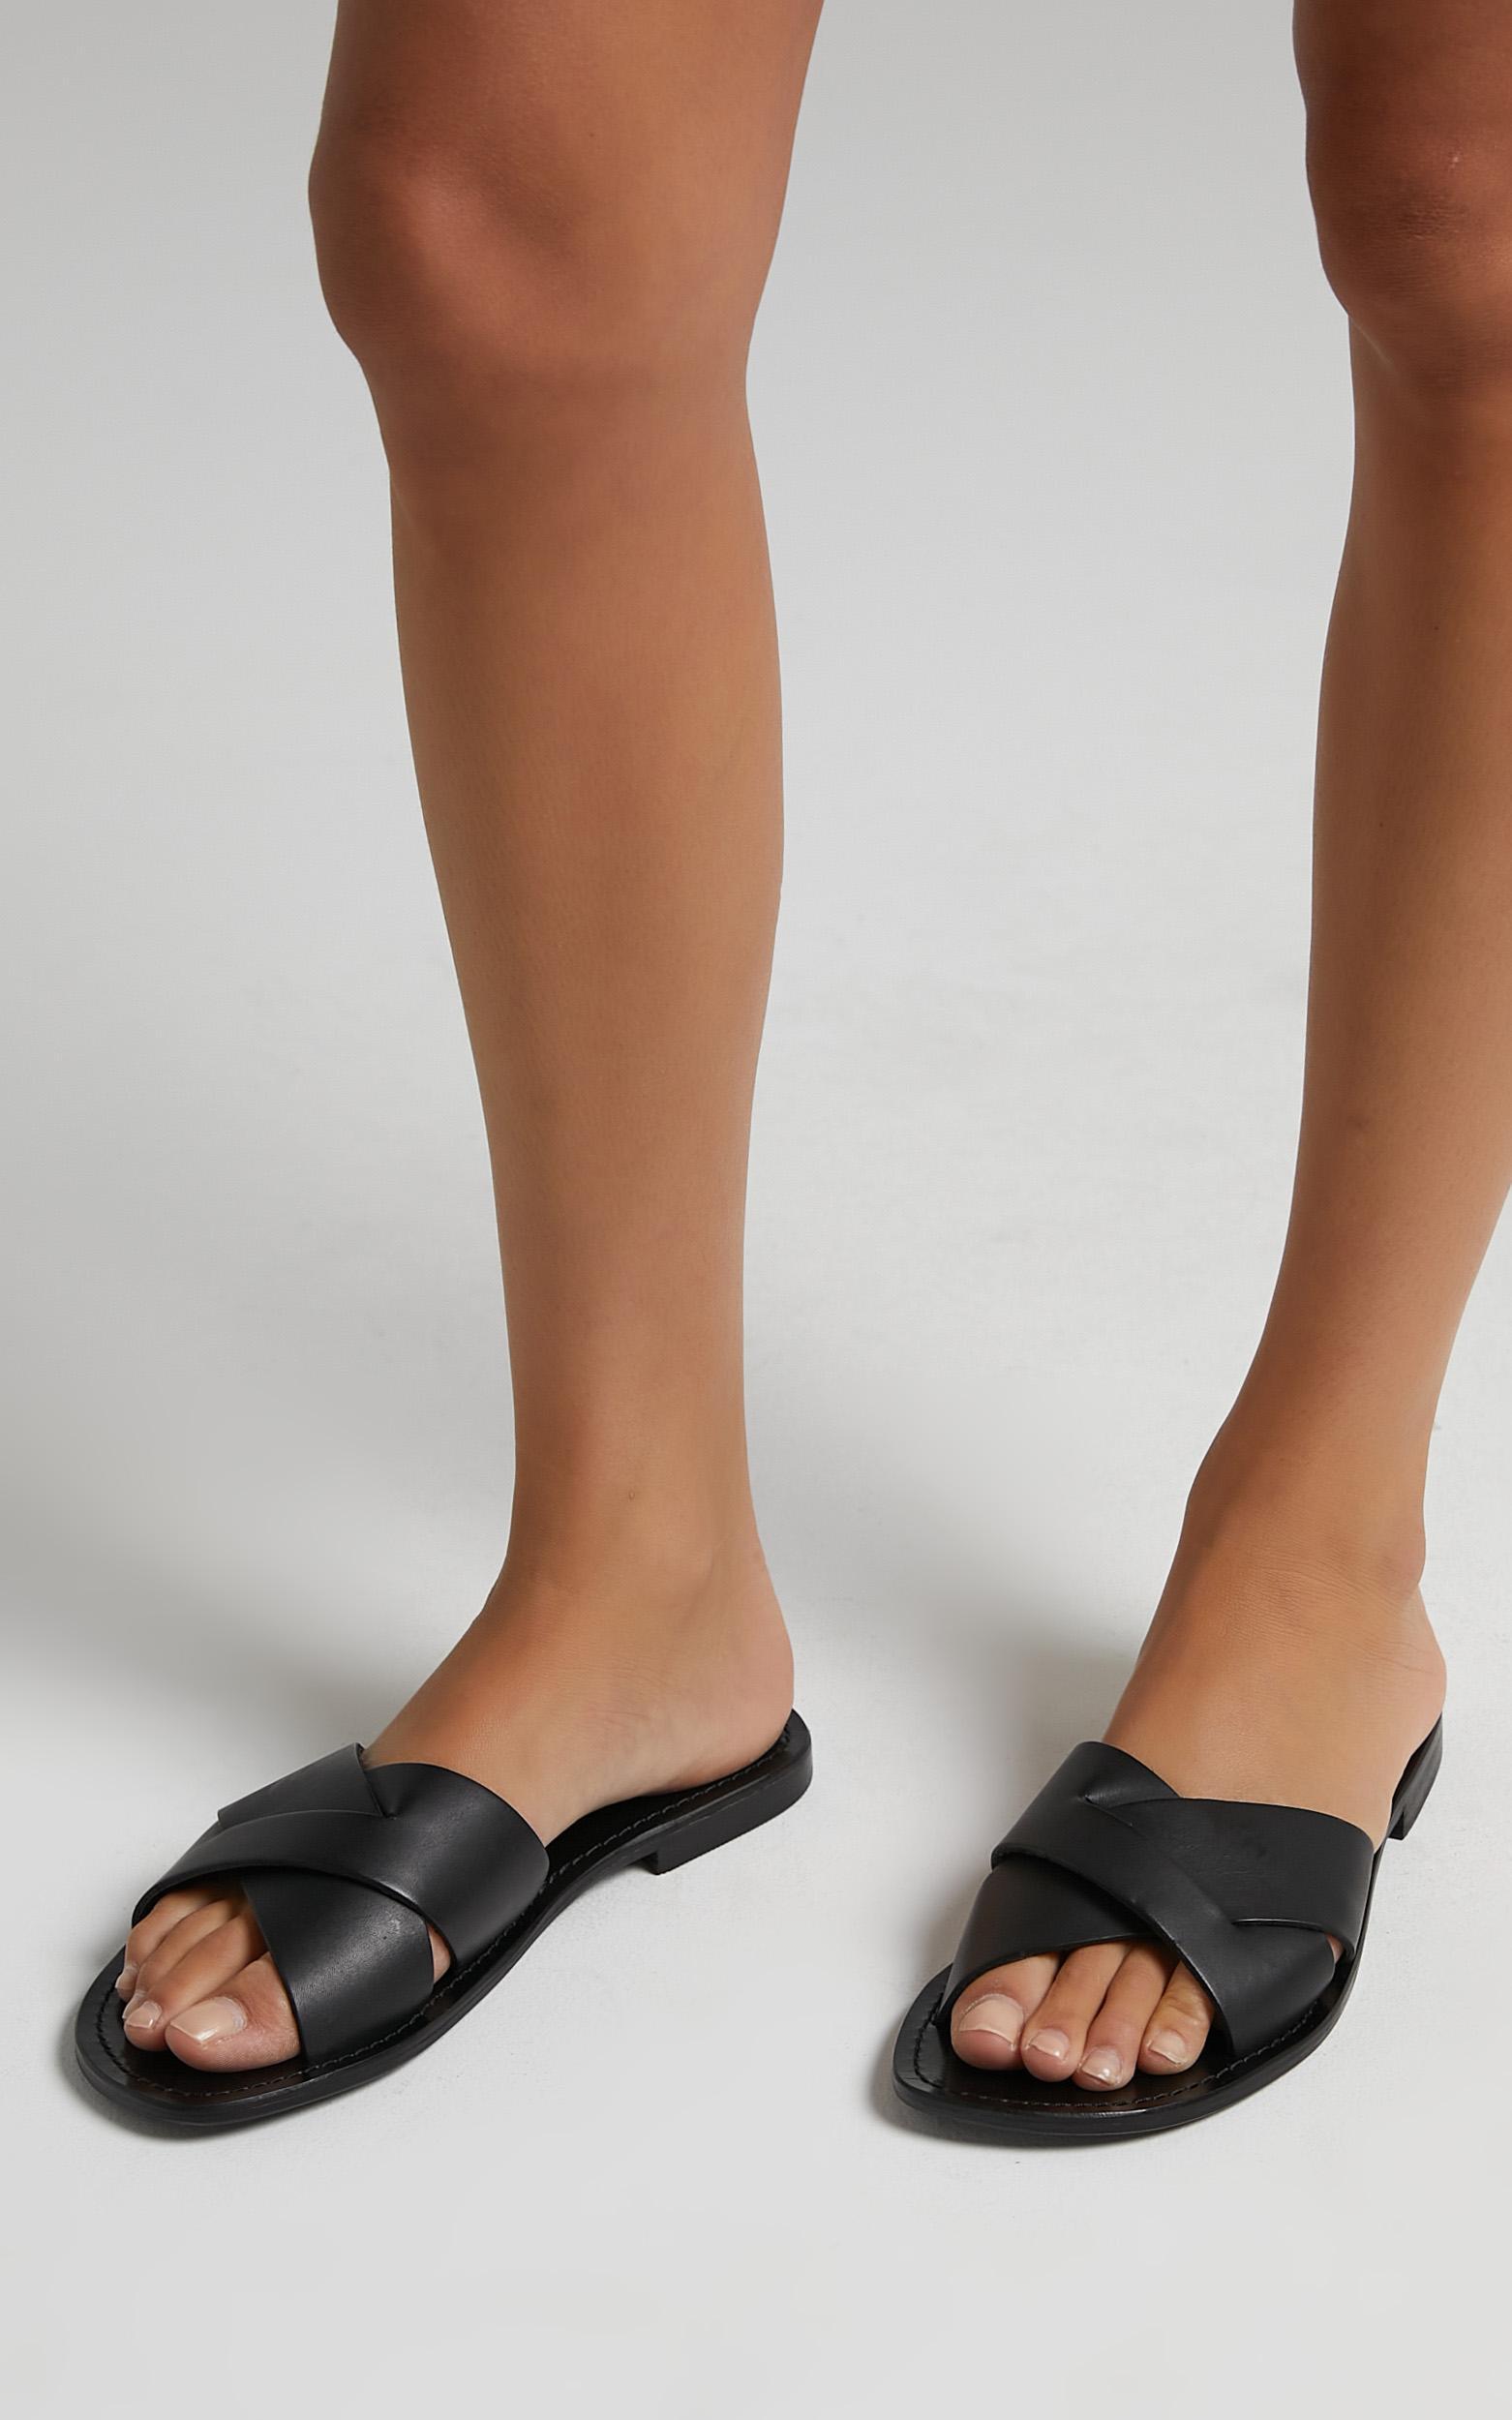 Tony Bianco - Alegra Sandals in Black - 5, Black, hi-res image number null